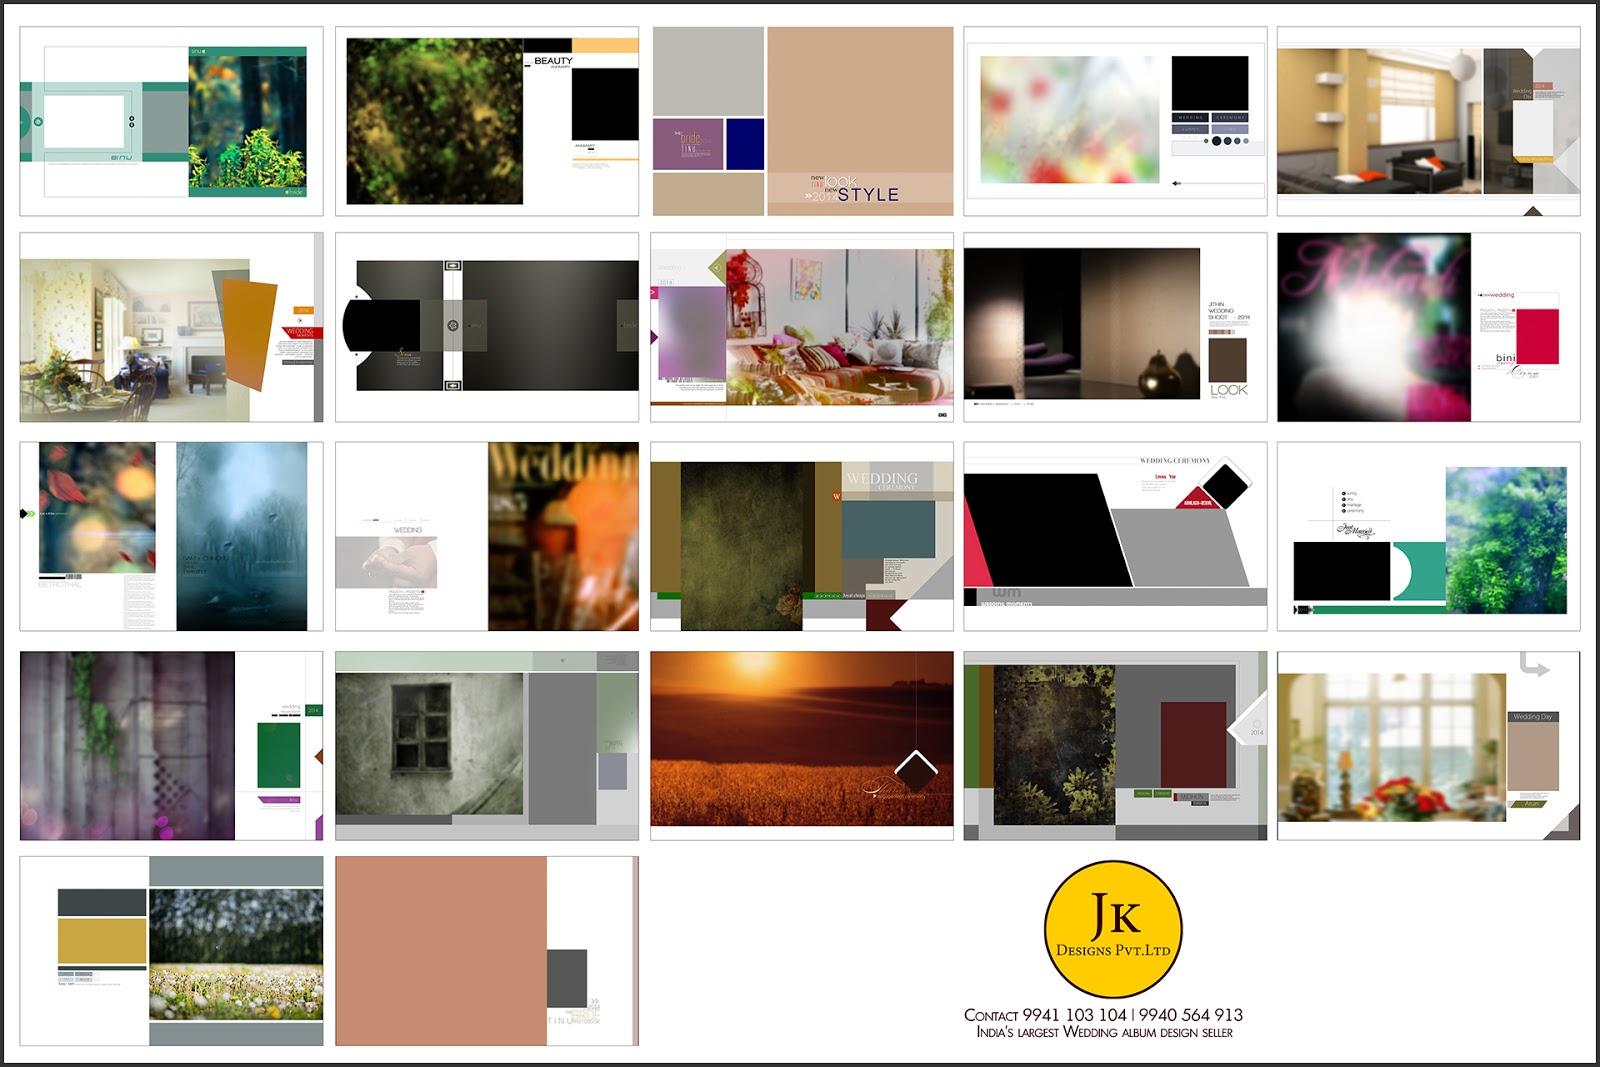 Jk Wedding Album Templates PSD Format For Sale in INDIA Super